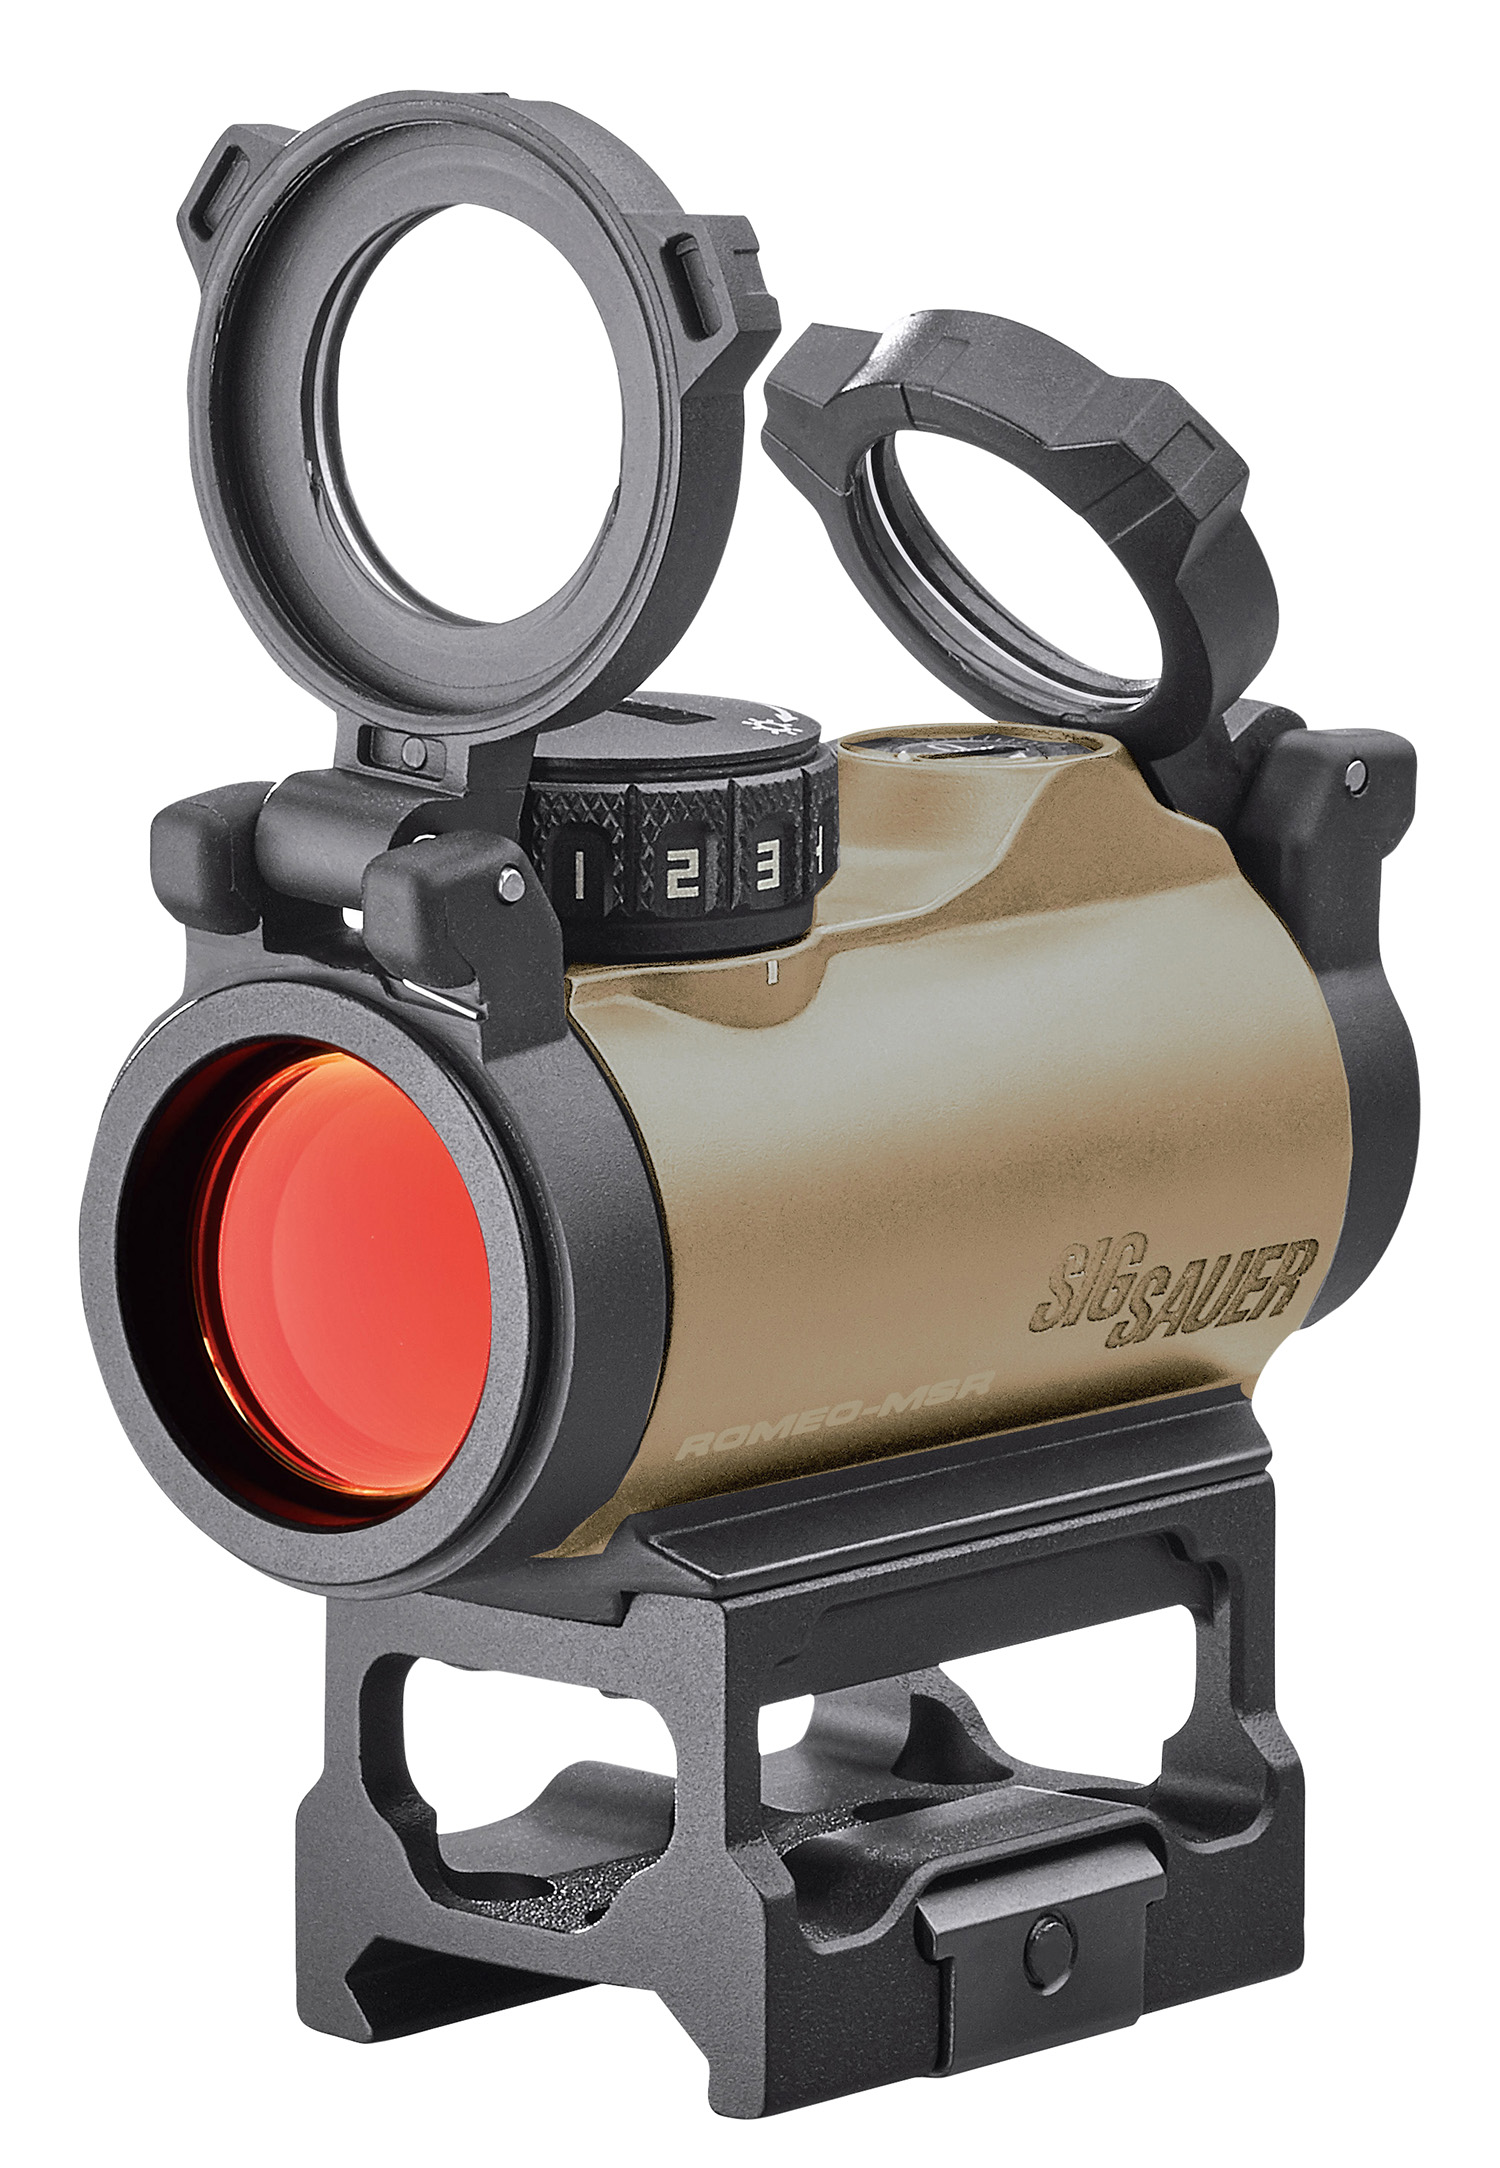 Sig Sauer Electro-Optics SOR72011 Romeo-MSR  Handgun MSR/Carbine/Shotgun/Air Rifle 1x20mm 2 MOA Red Dot Flat Dark Earth